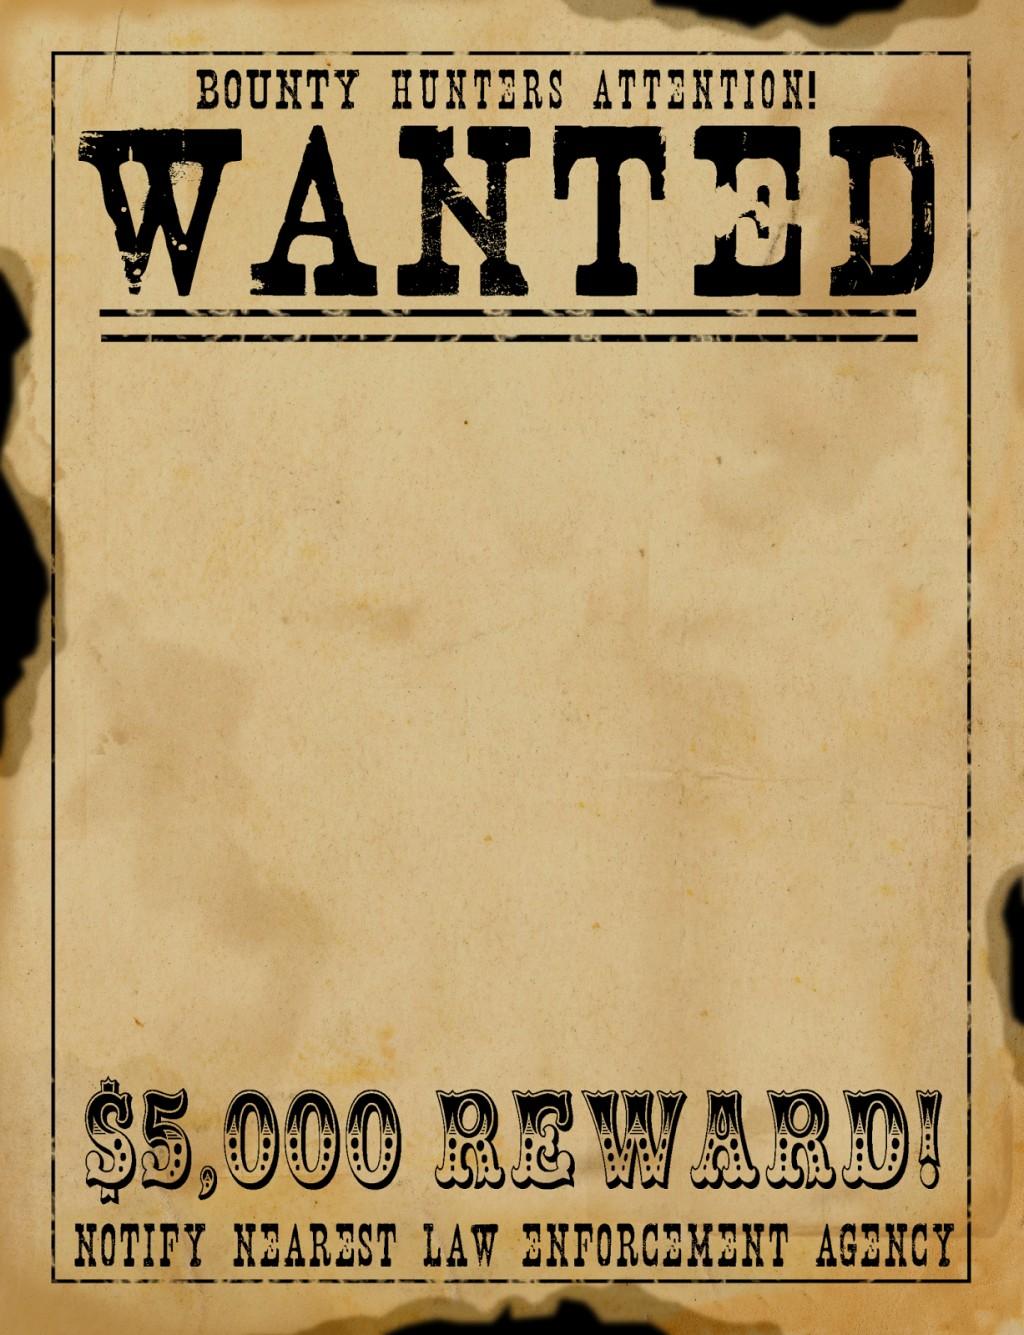 027 Template Ideas 1057285 Certificate Clipart Western.